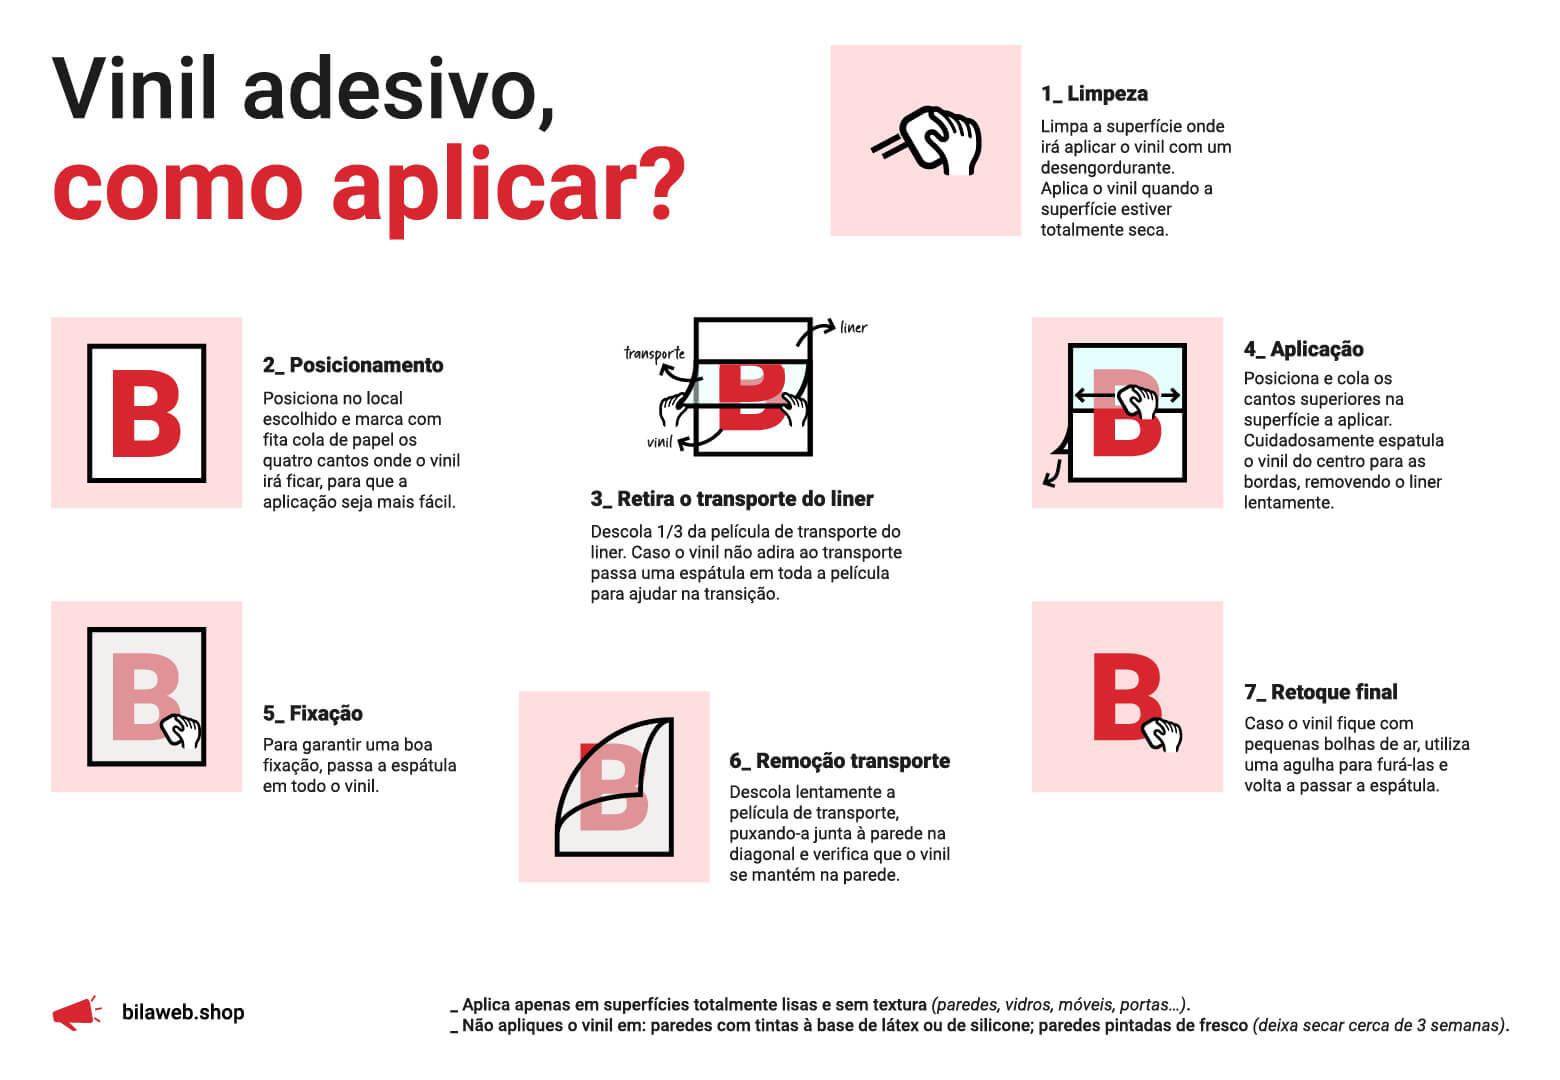 Como aplicar vinil adesivo - bilaweb.shop